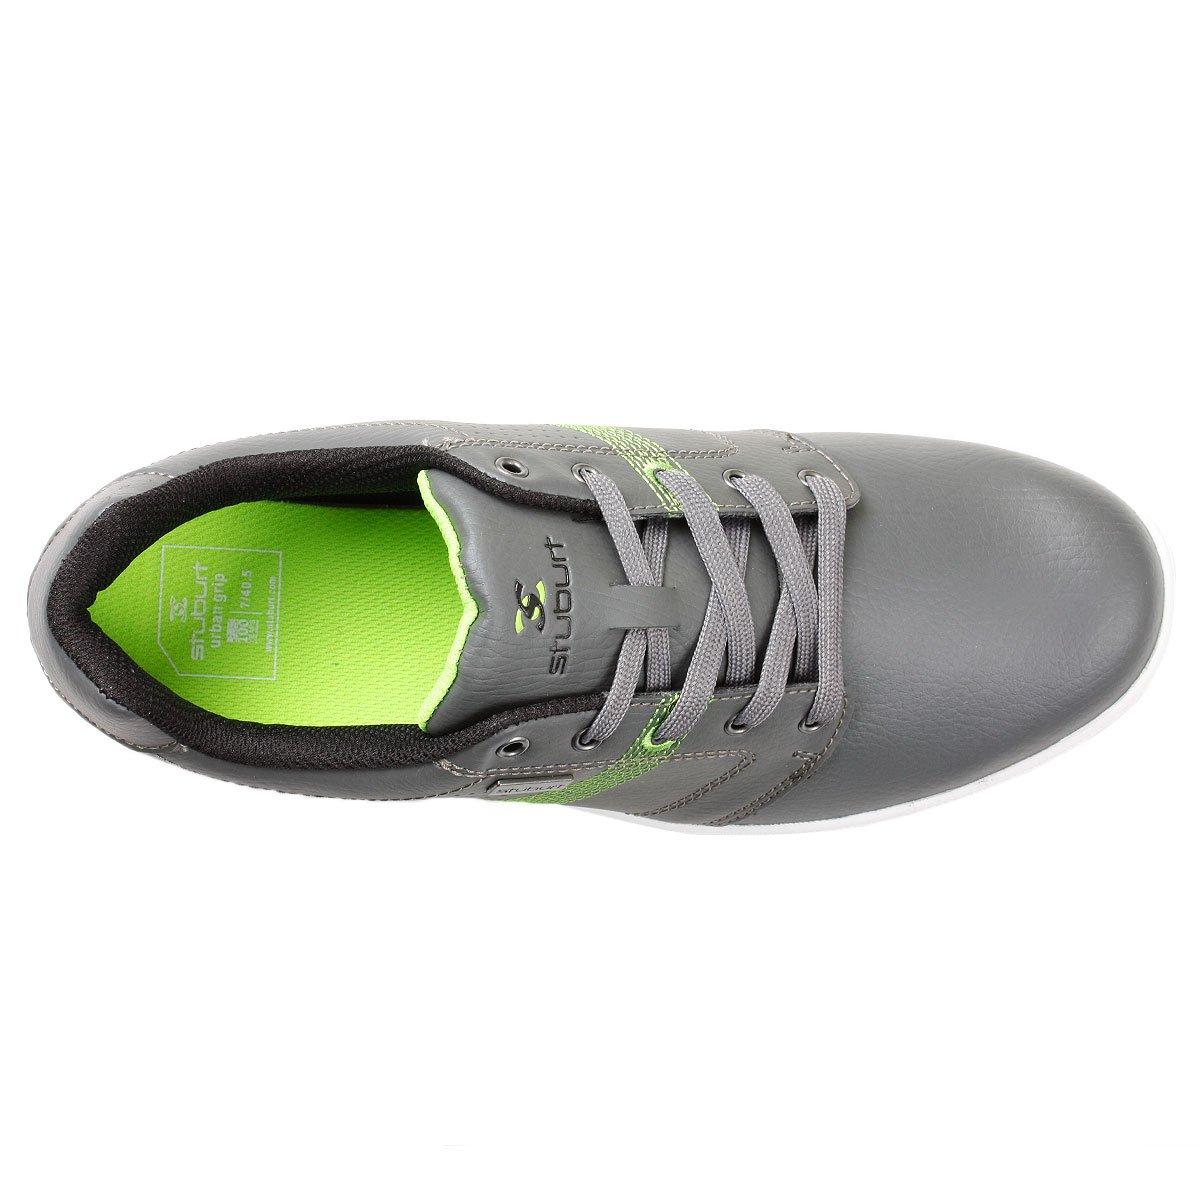 fb3c4f1bf554b Stuburt- Zapatos de golf sin tacos de estilo urbano